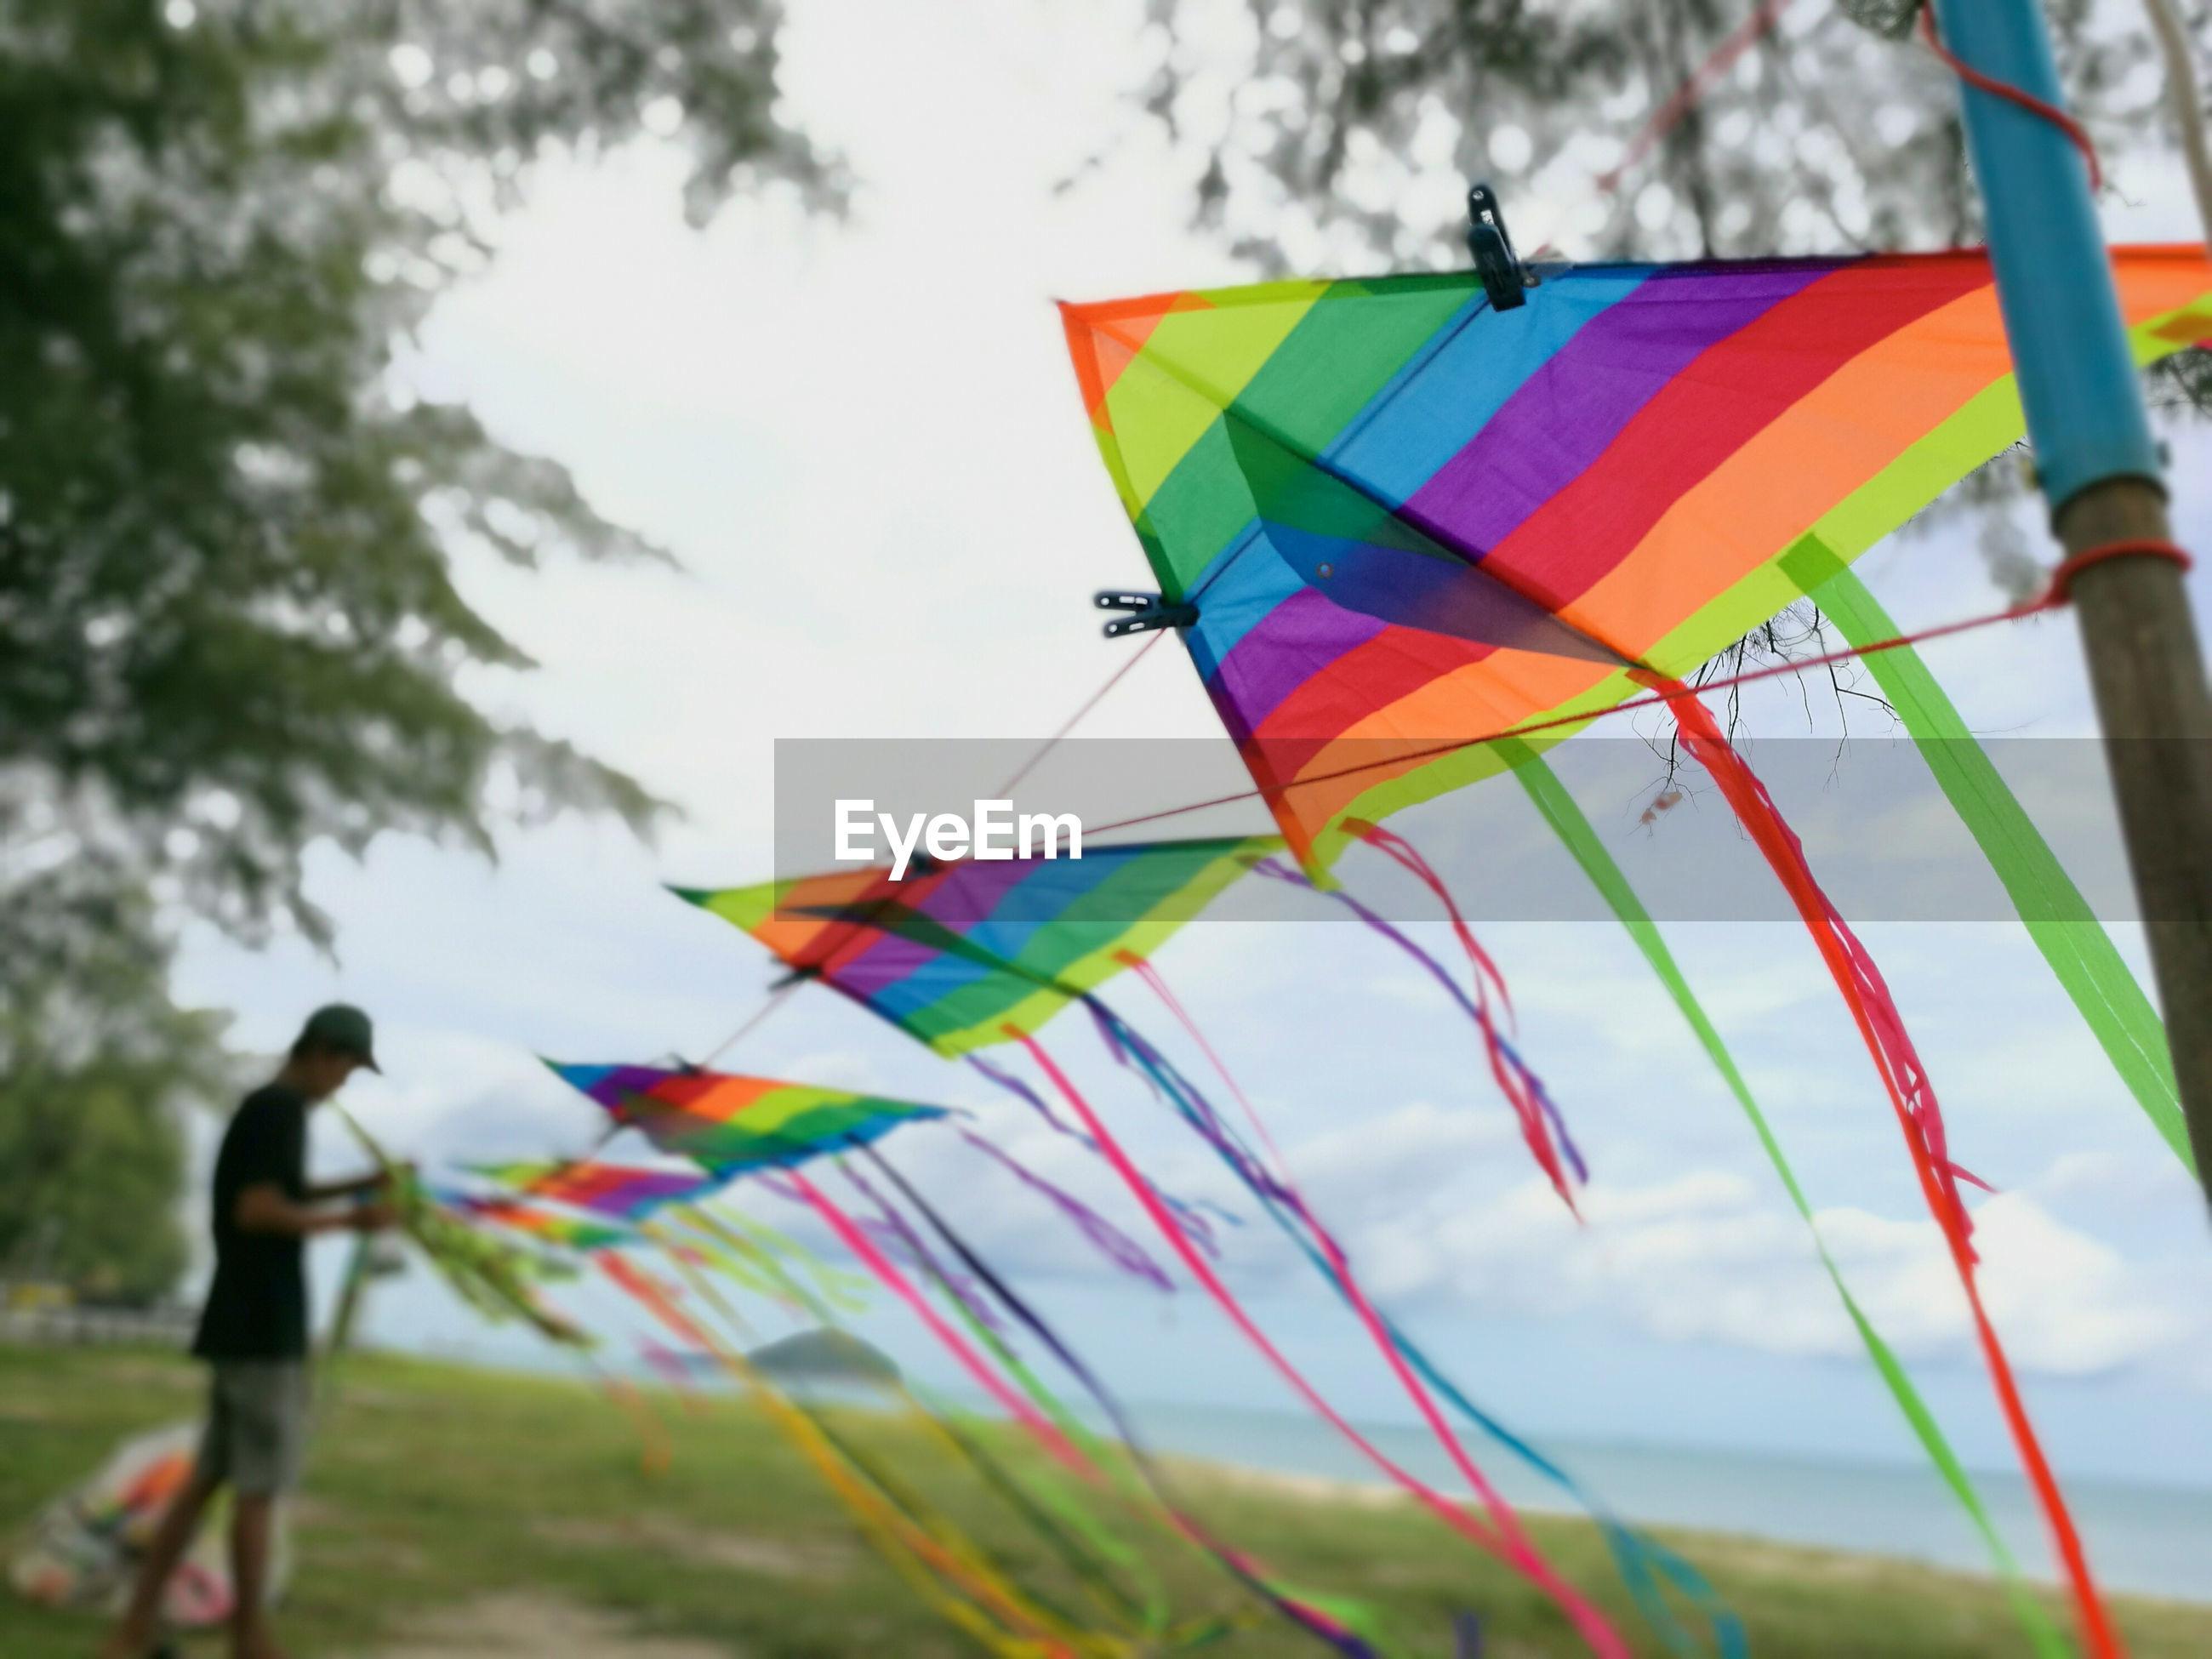 Colorful kites on clothesline against sky